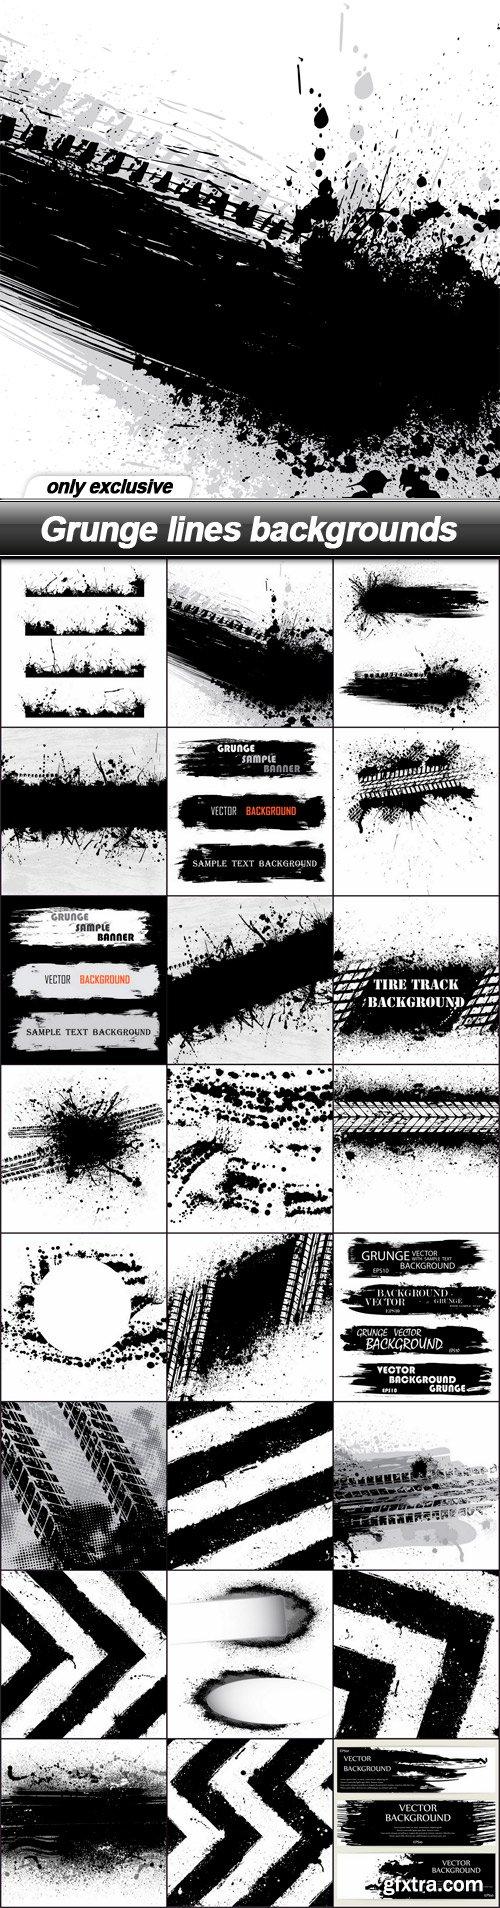 Grunge lines backgrounds - 24 EPS